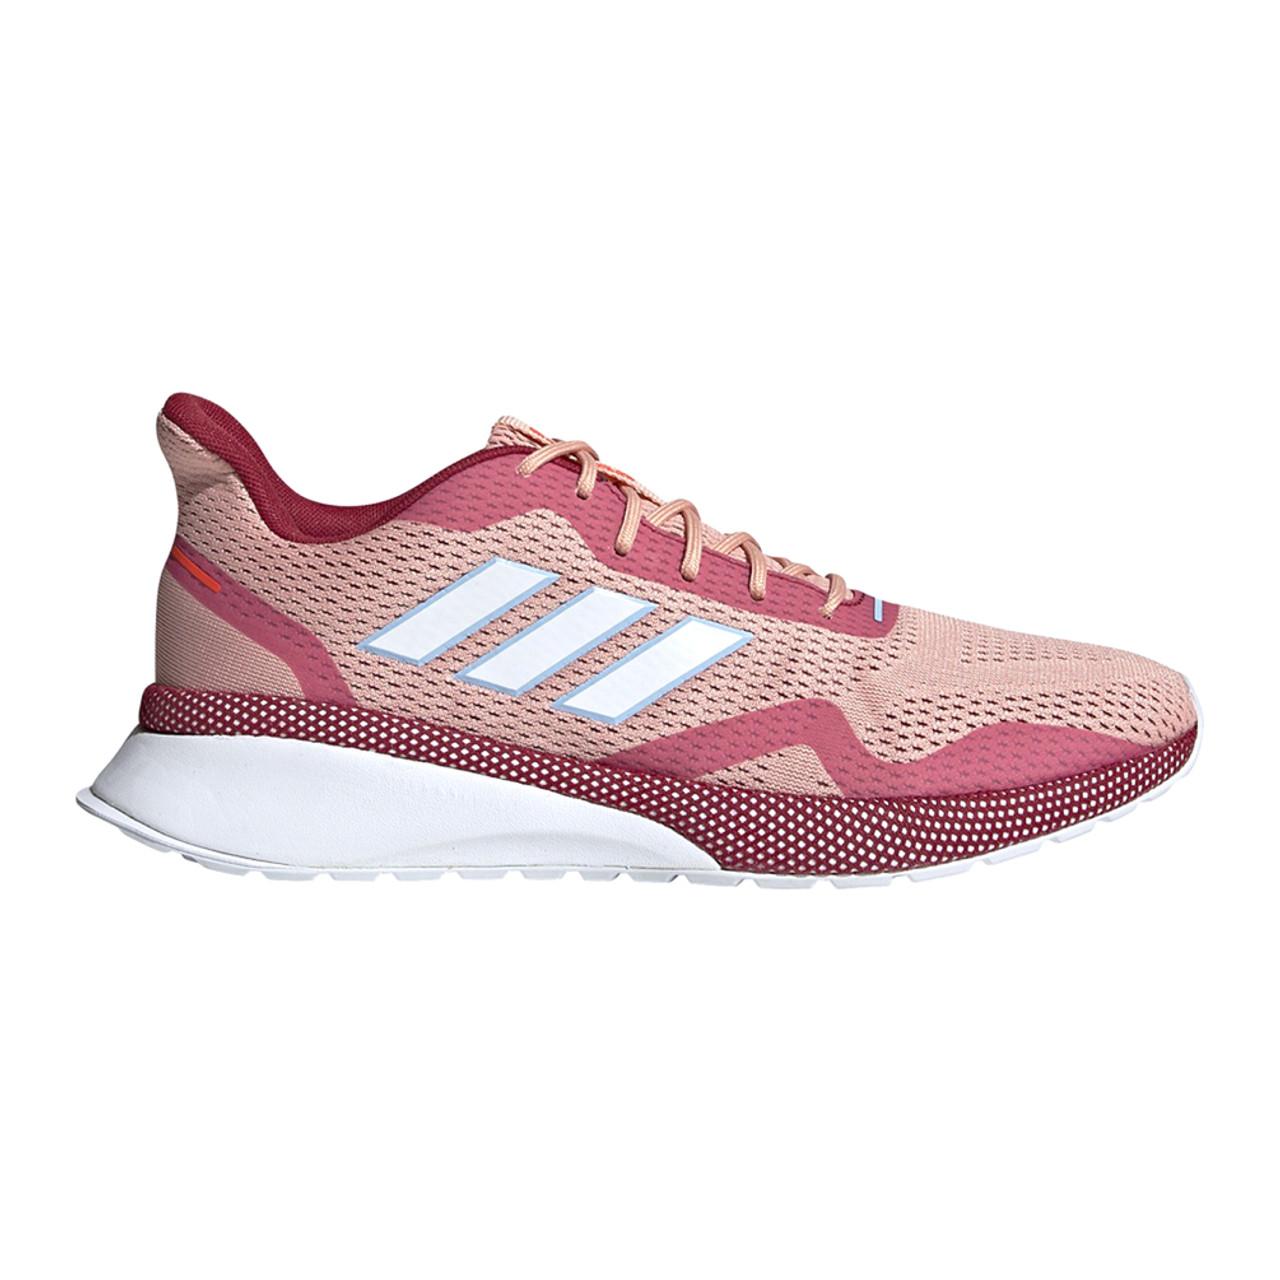 Adidas Women's Nova Run X Running Shoe PinkMaroon